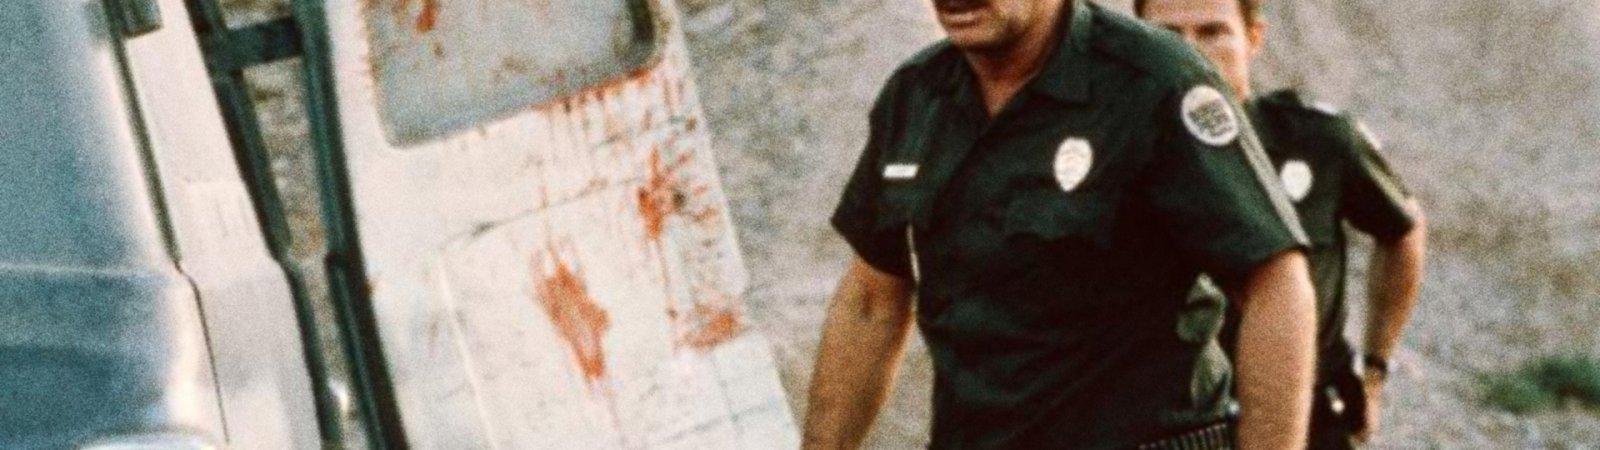 Photo du film : Police frontiere